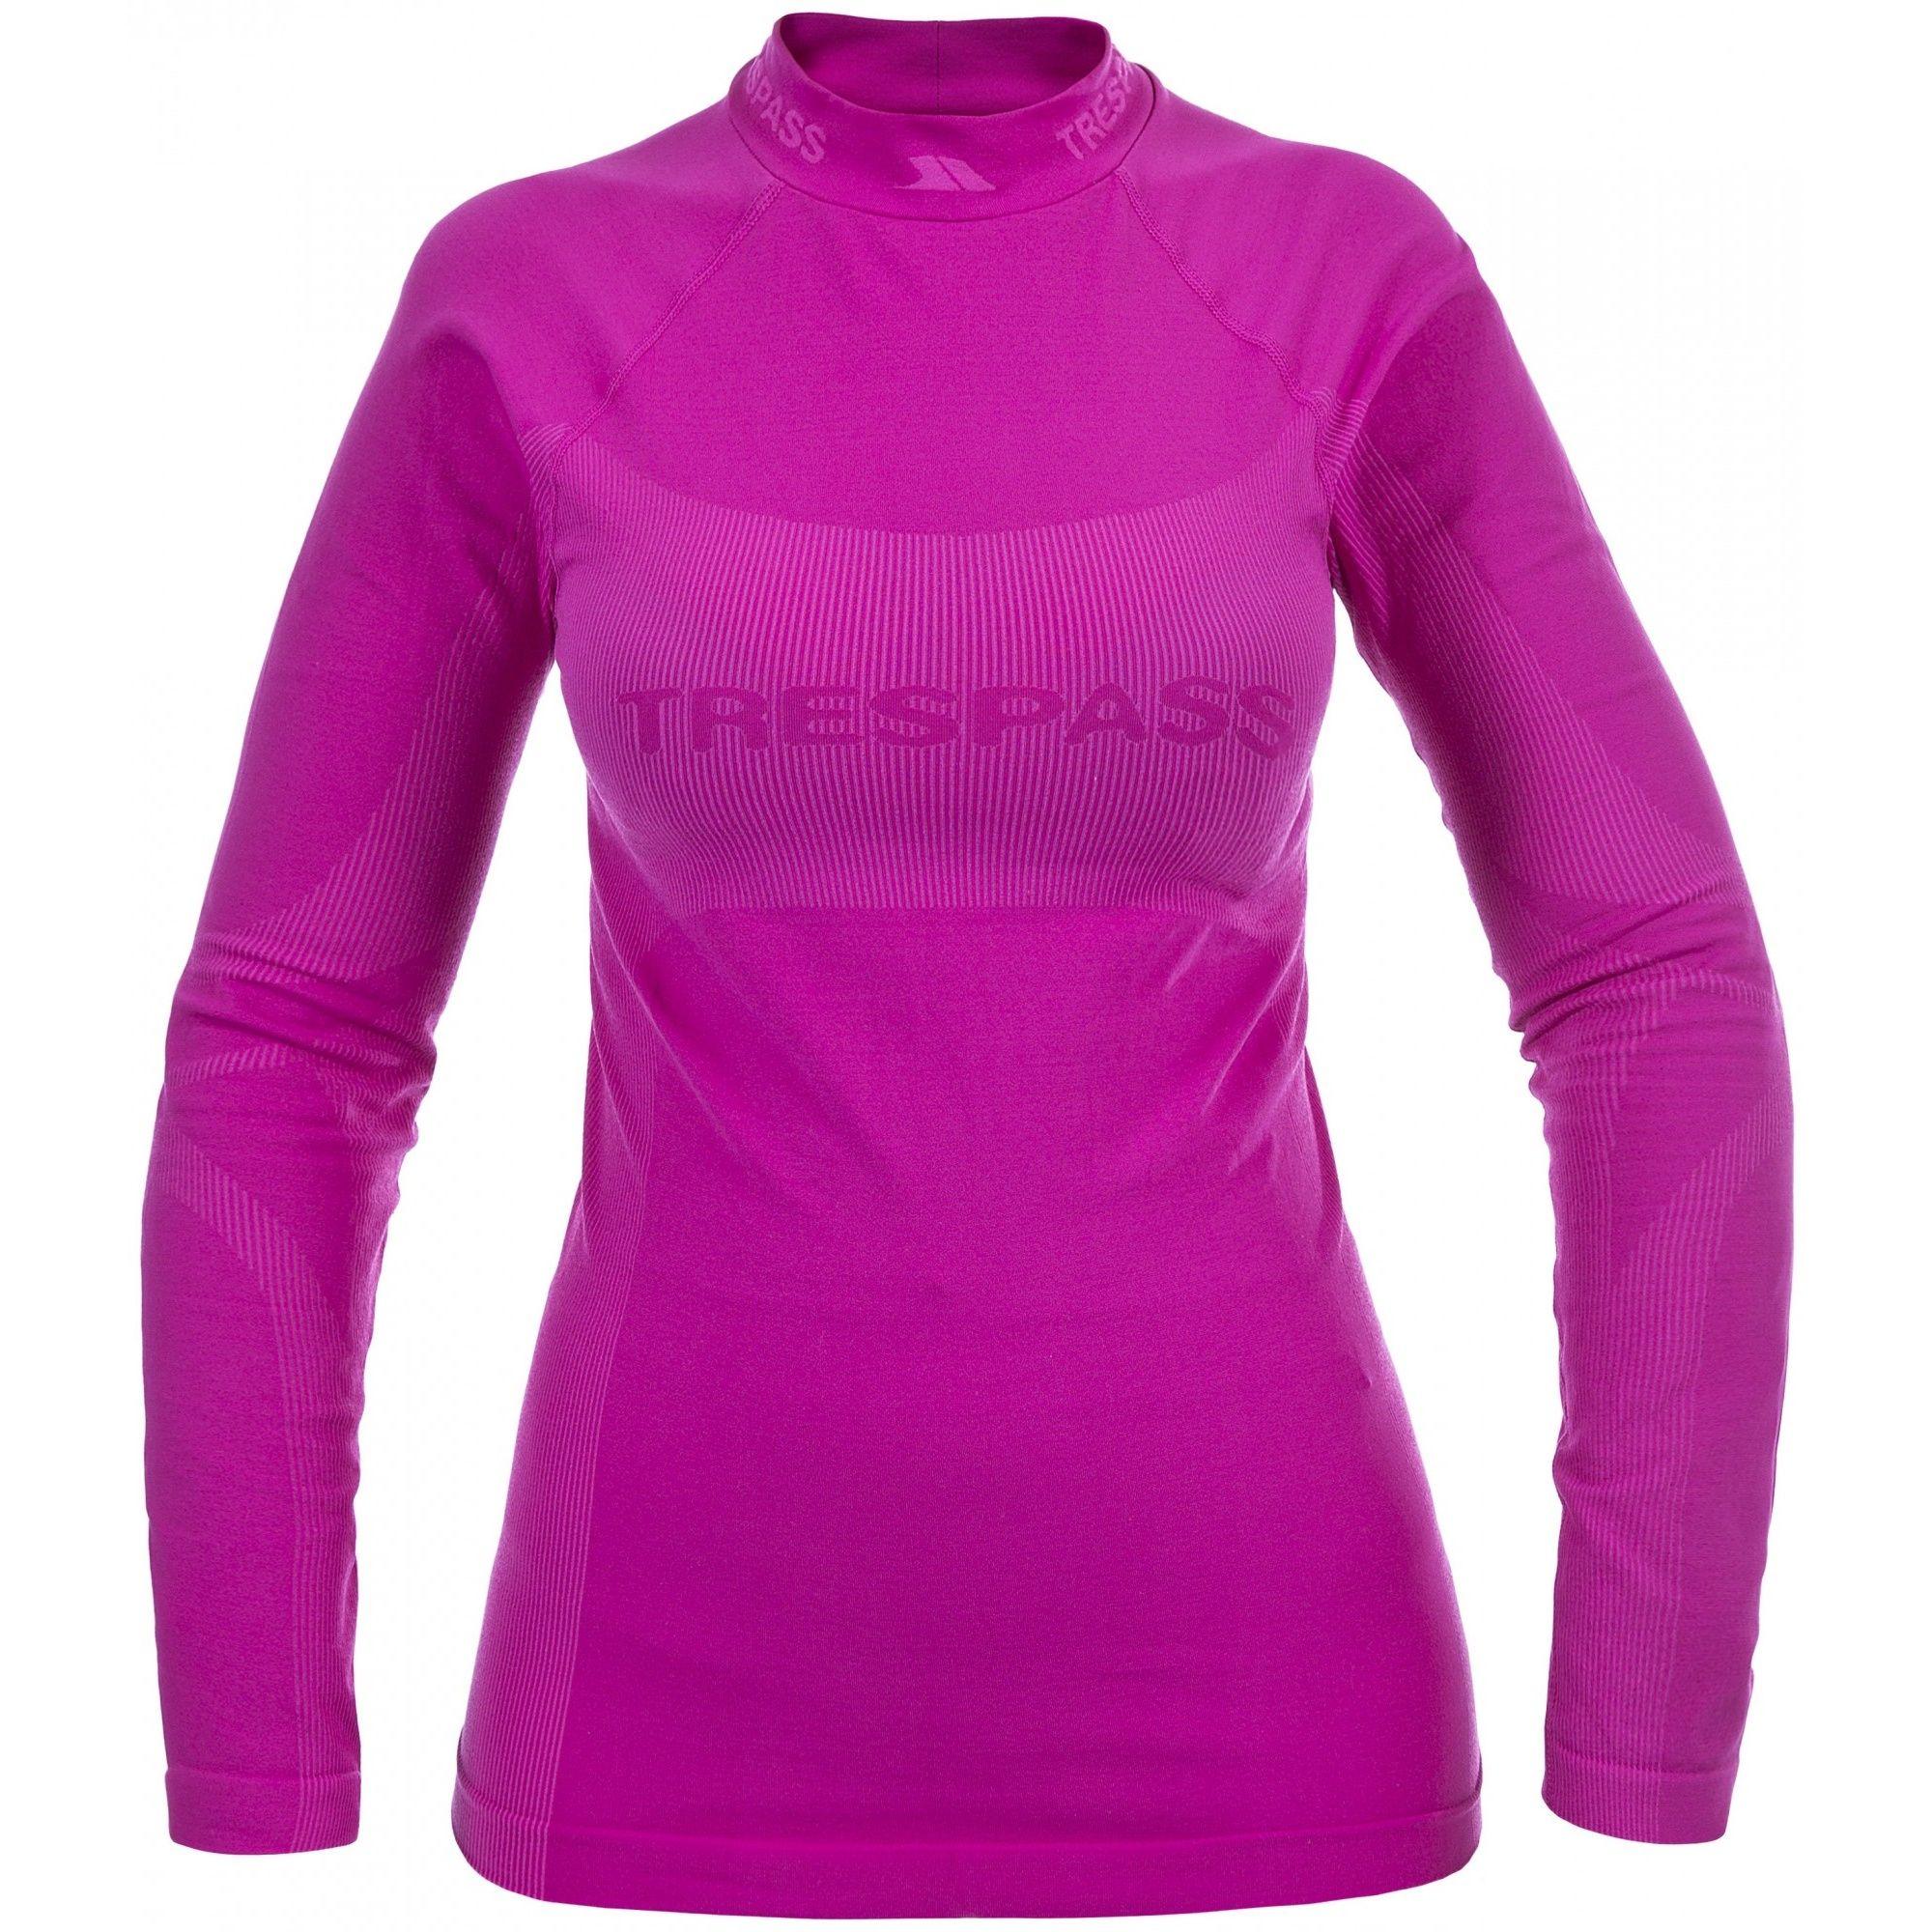 Trespass Womens/Ladies Endeavor Long Sleeve Baselayer Top